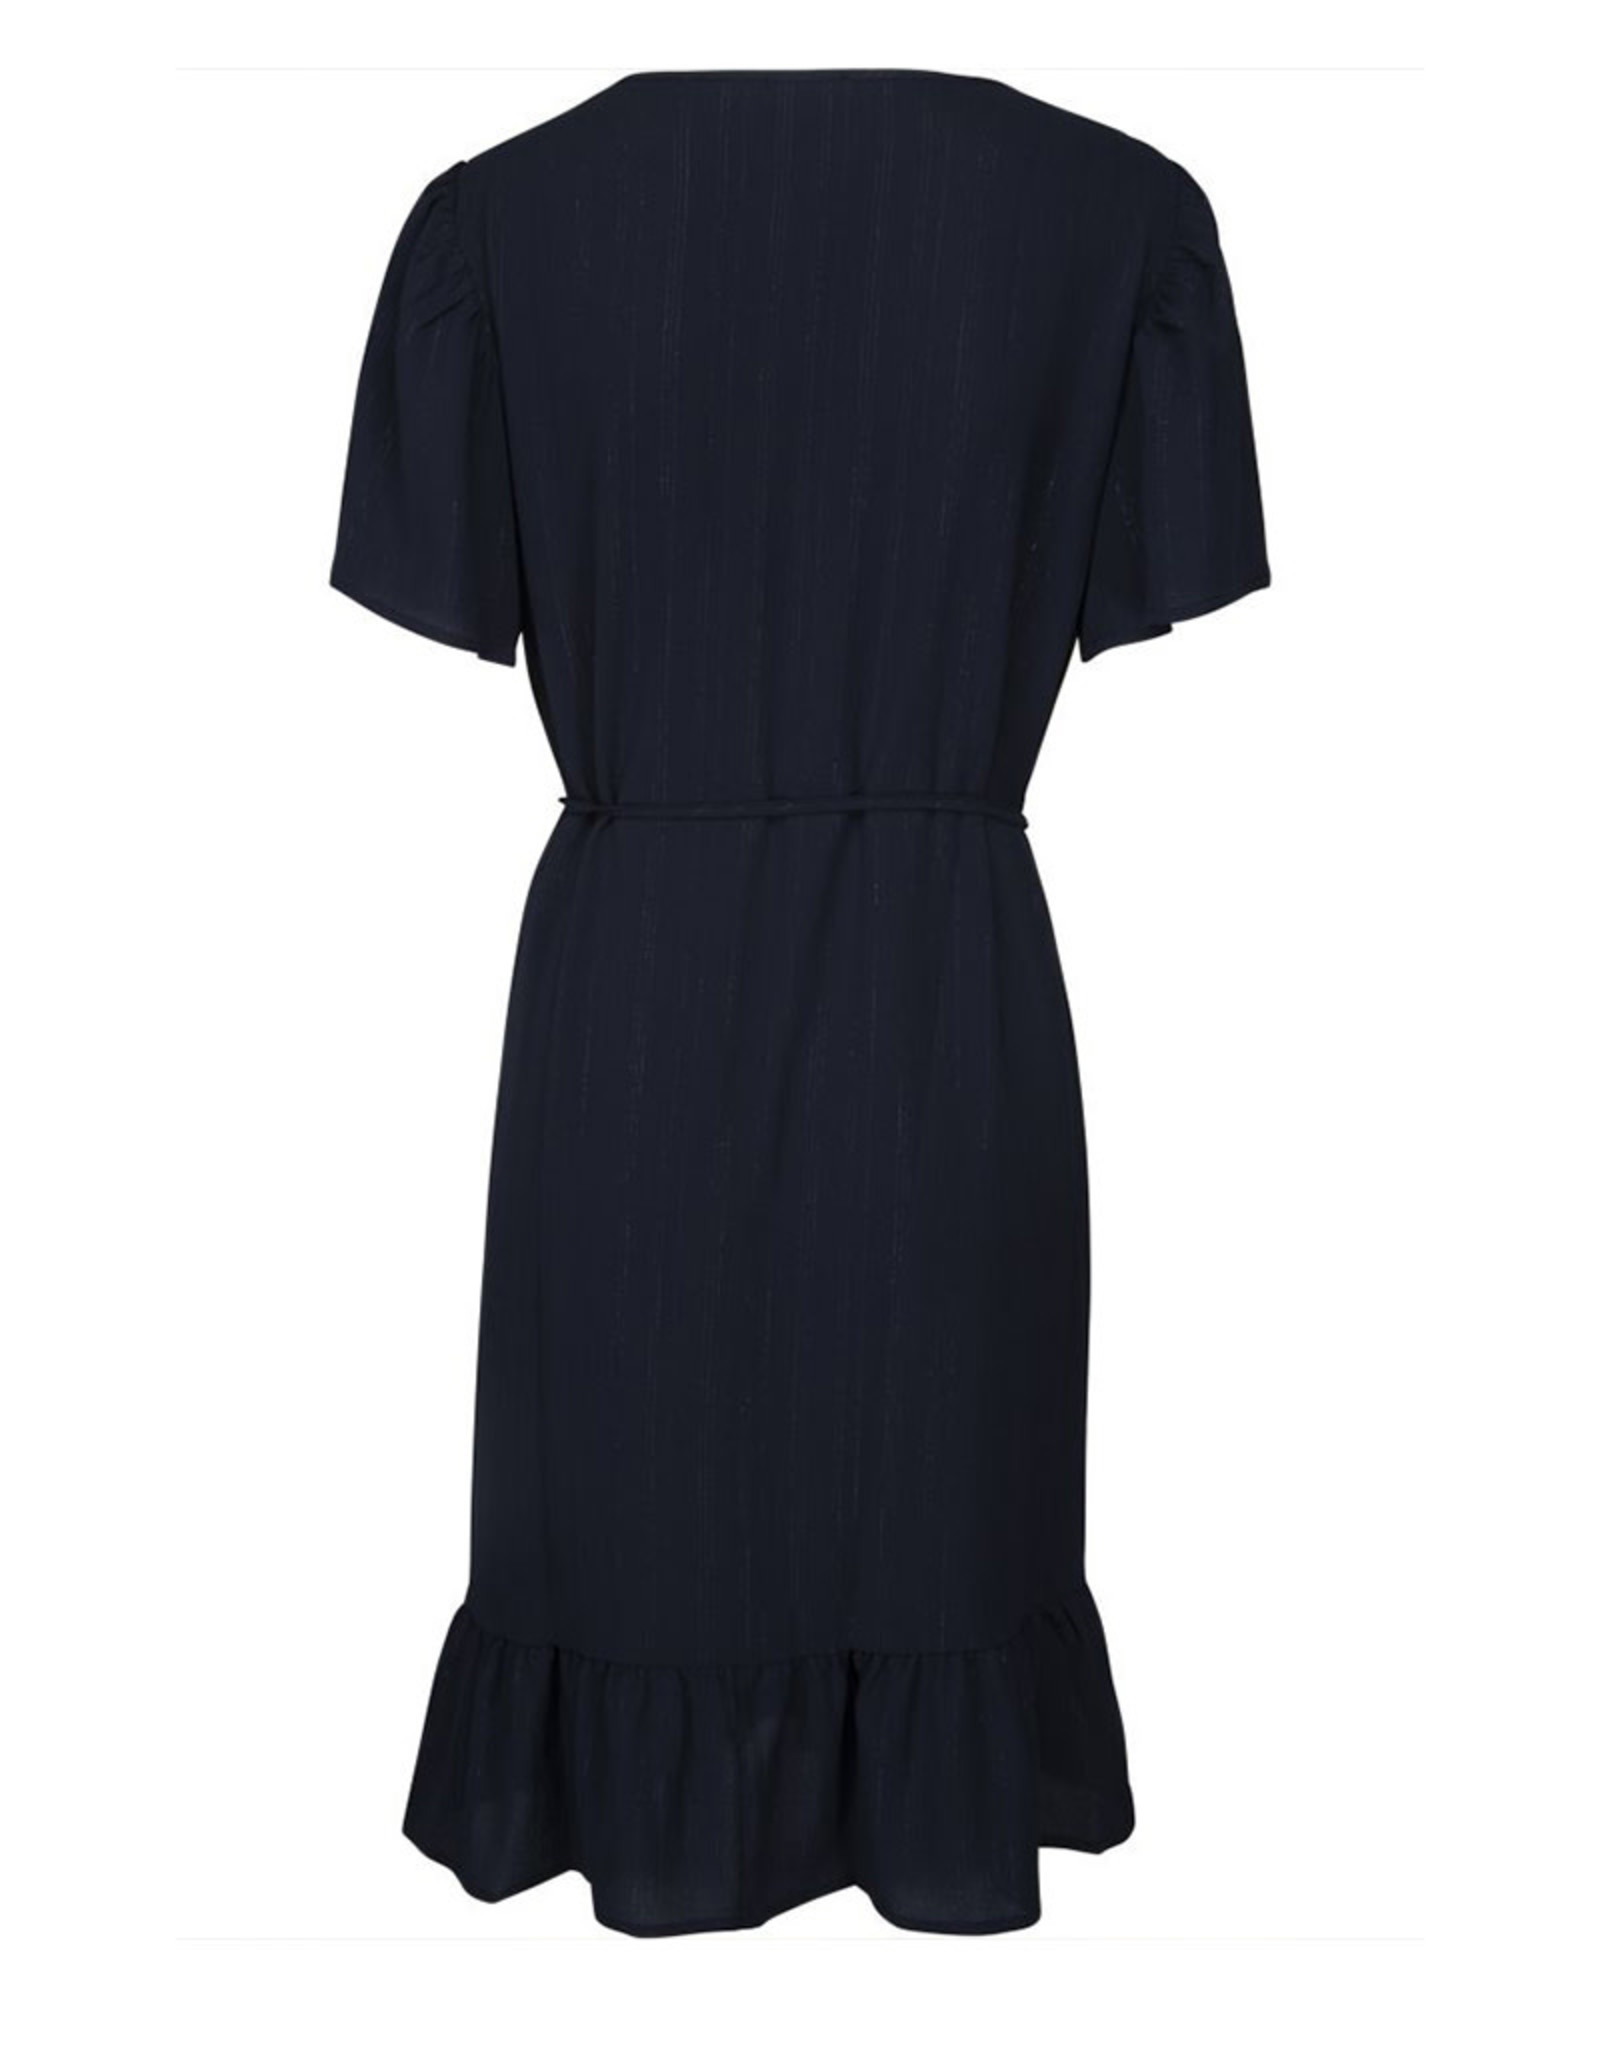 minus July Dress